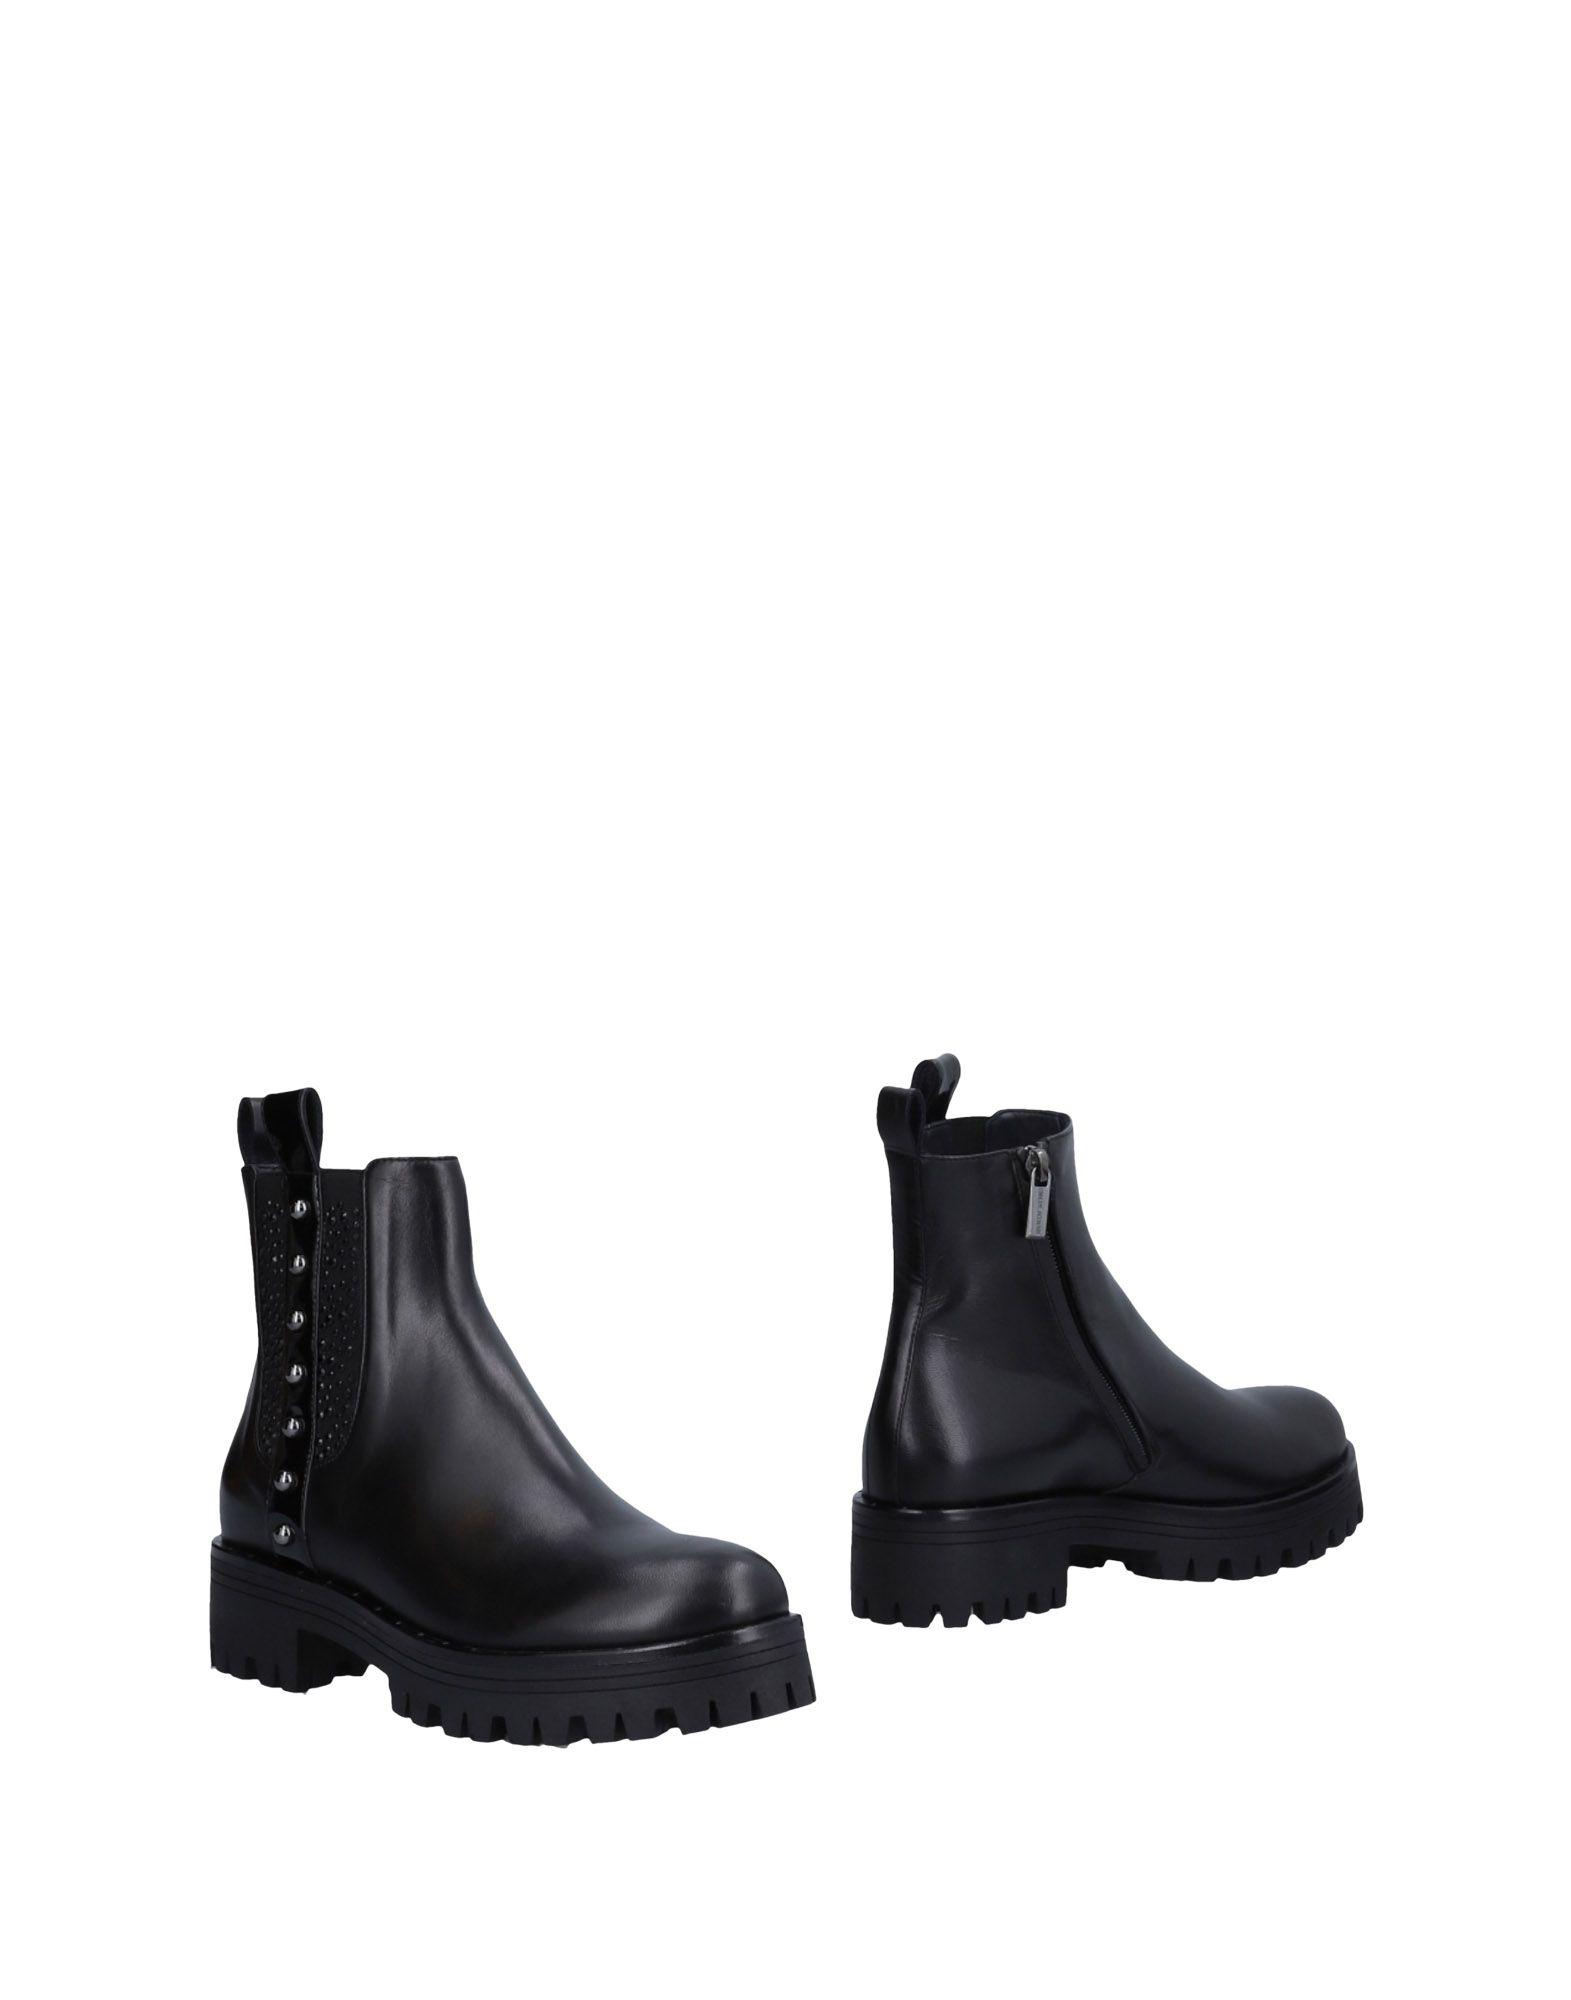 Loretta Pettinari Stiefelette Damen  11494332EWGut aussehende strapazierfähige Schuhe